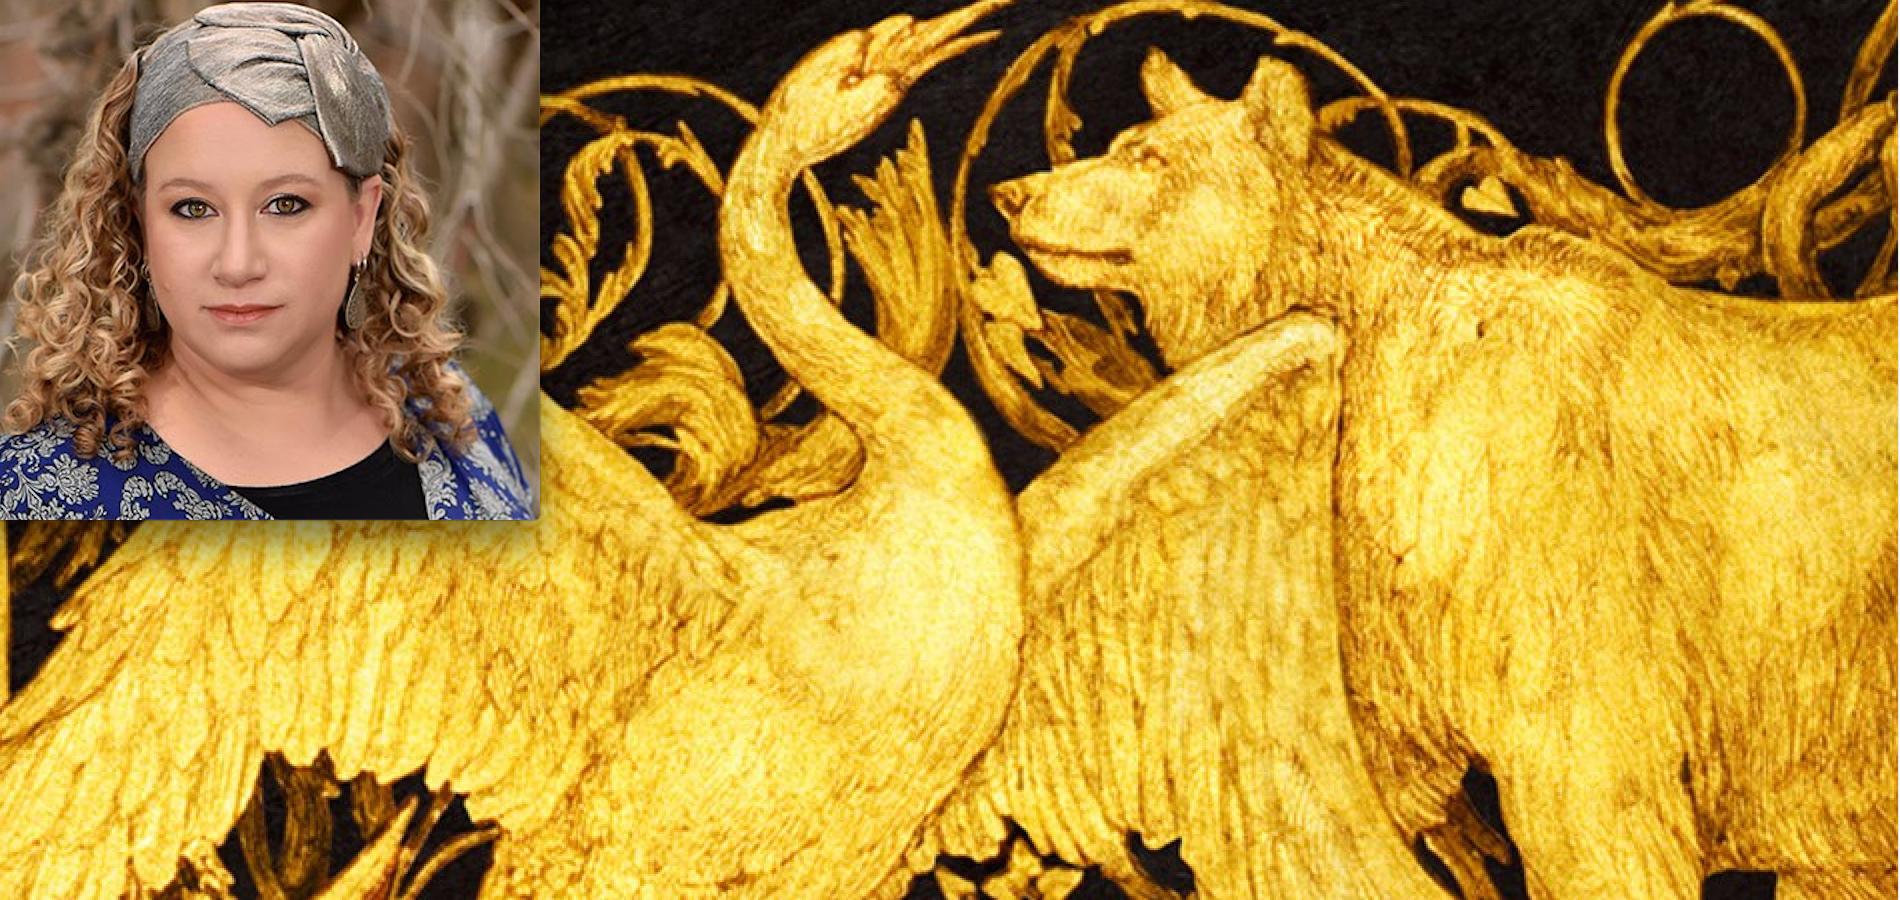 Meet the Critically-Acclaimed Orthodox Jewish Female Fantasy Author